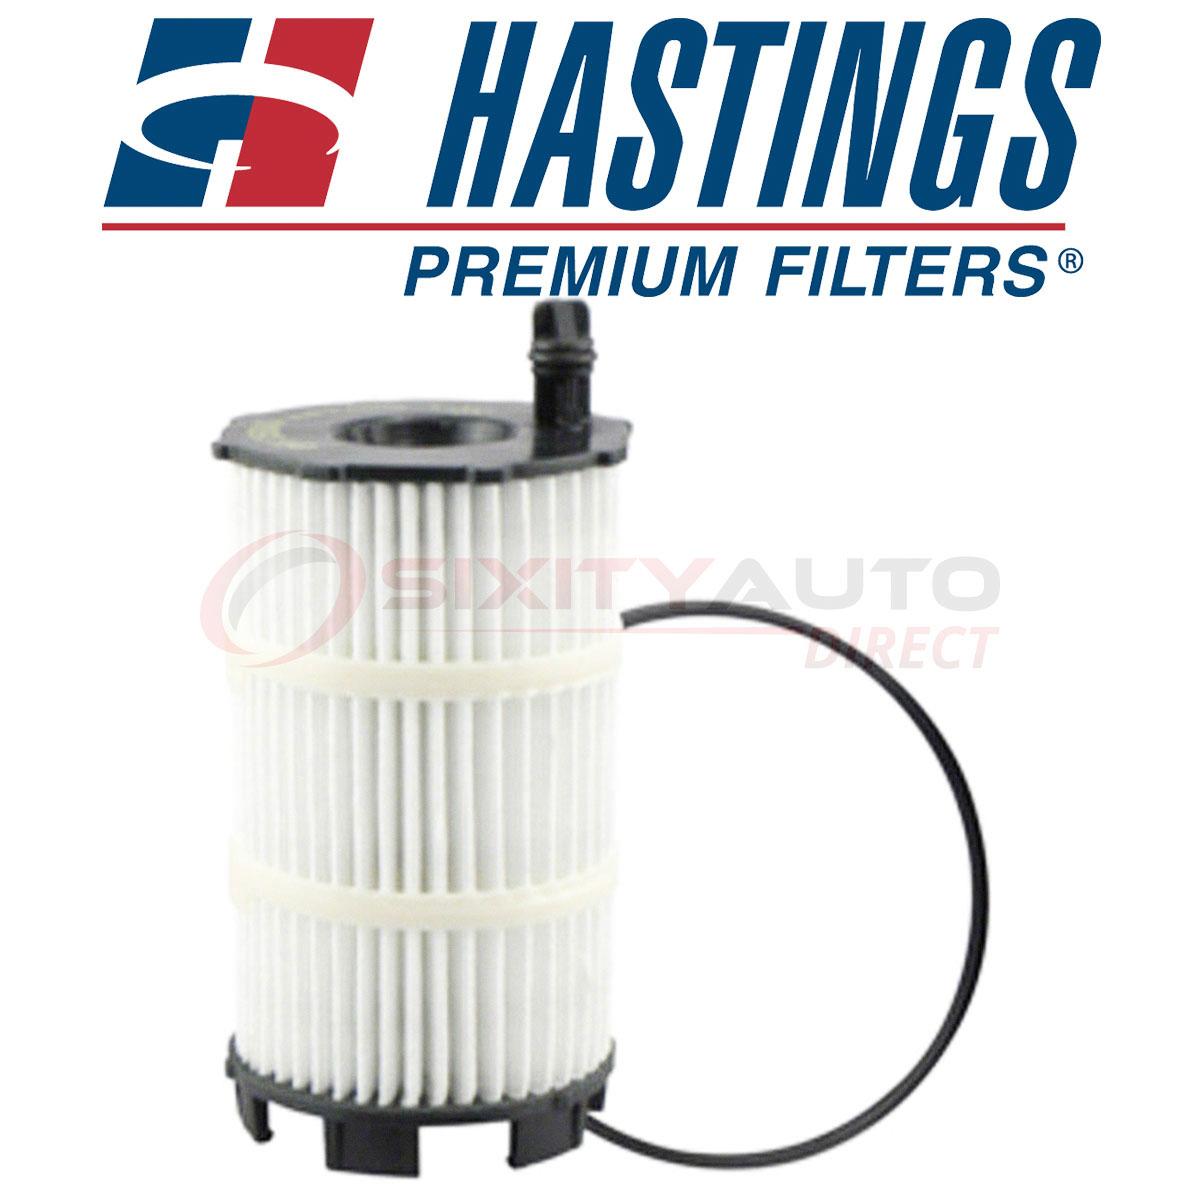 Hastings Engine Oil Filter For 2008-2017 Audi R8 4.2L 5.2L